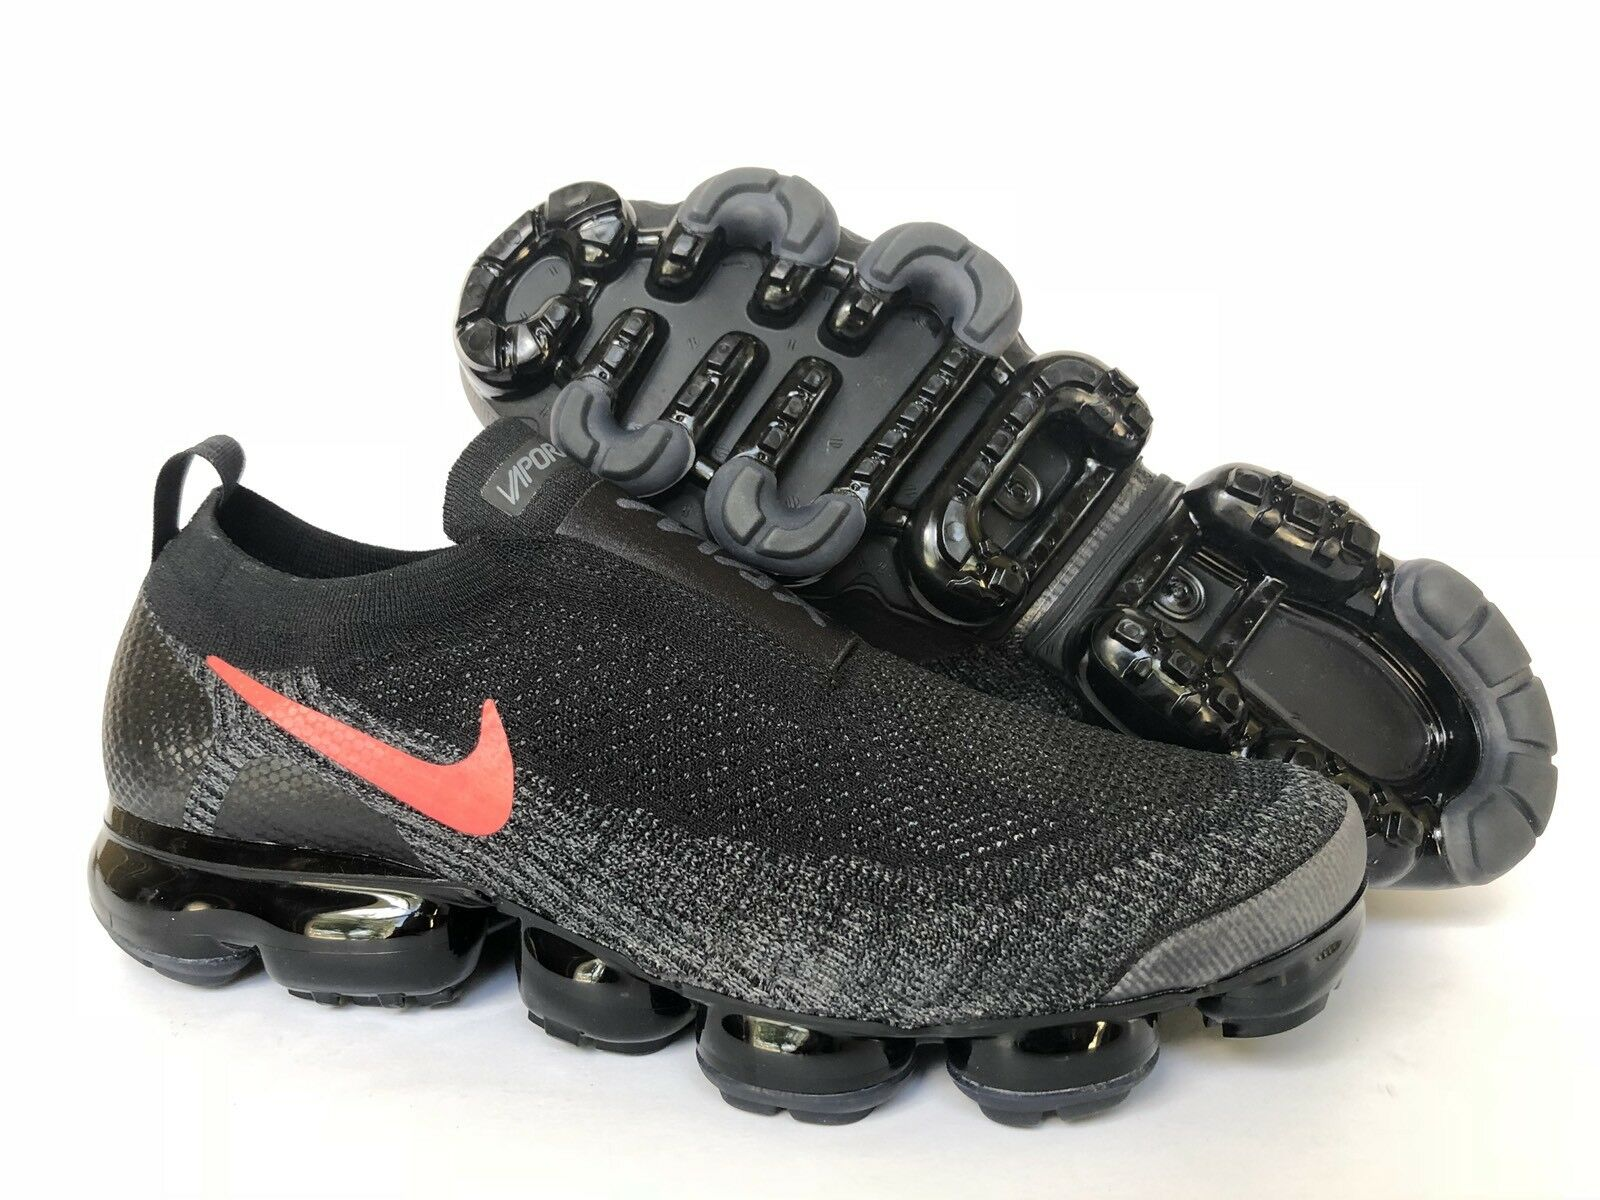 Nike - id vpr vapormax schwarz / rot [aq3841-991] wir männer sz 10,5